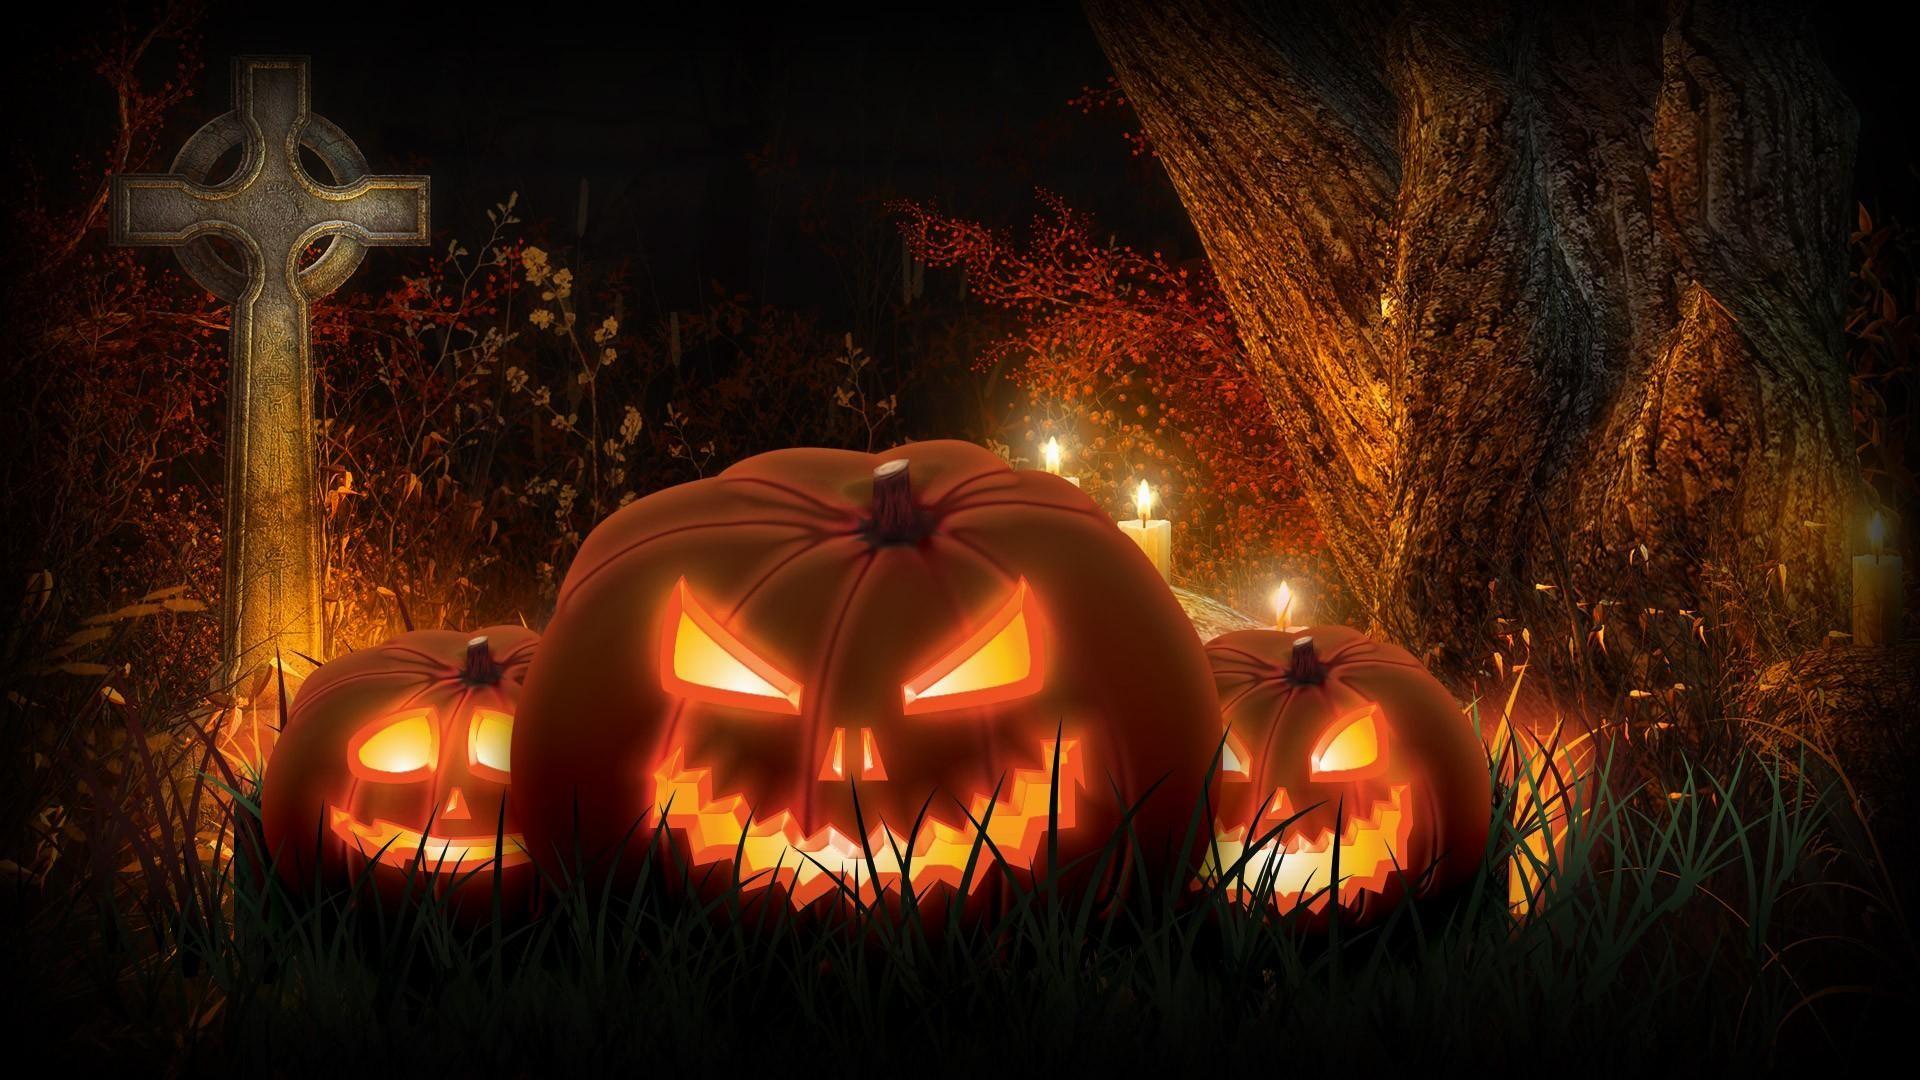 Halloween-scary-Jacck-skellington-spooky-cemetery-pumpkins